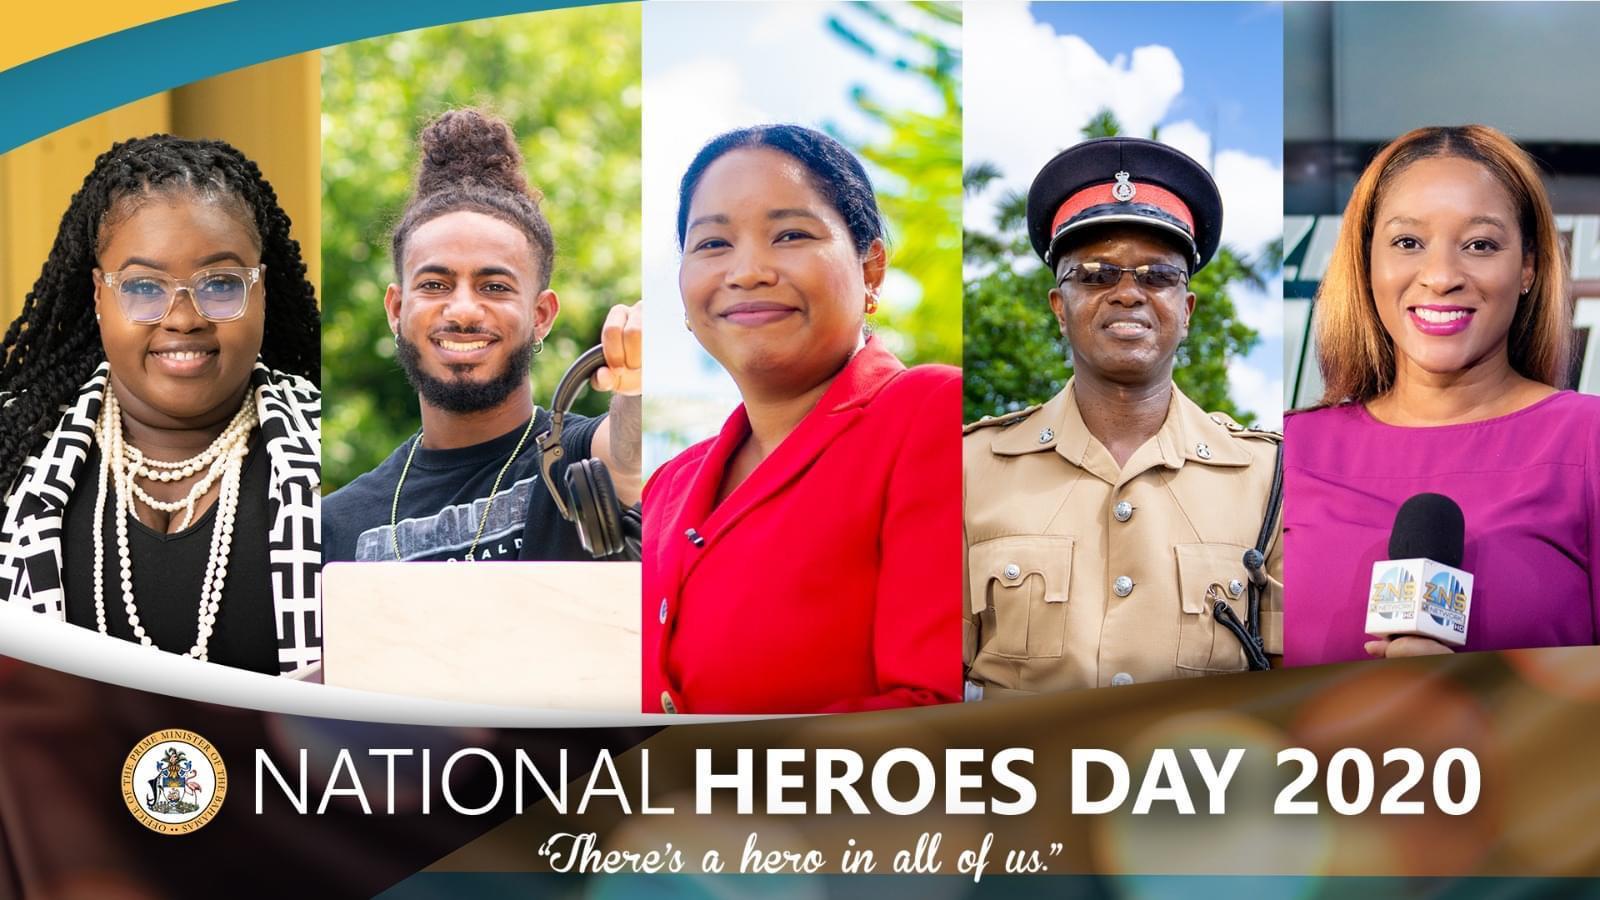 National Heroes Day honourees met with mixed views